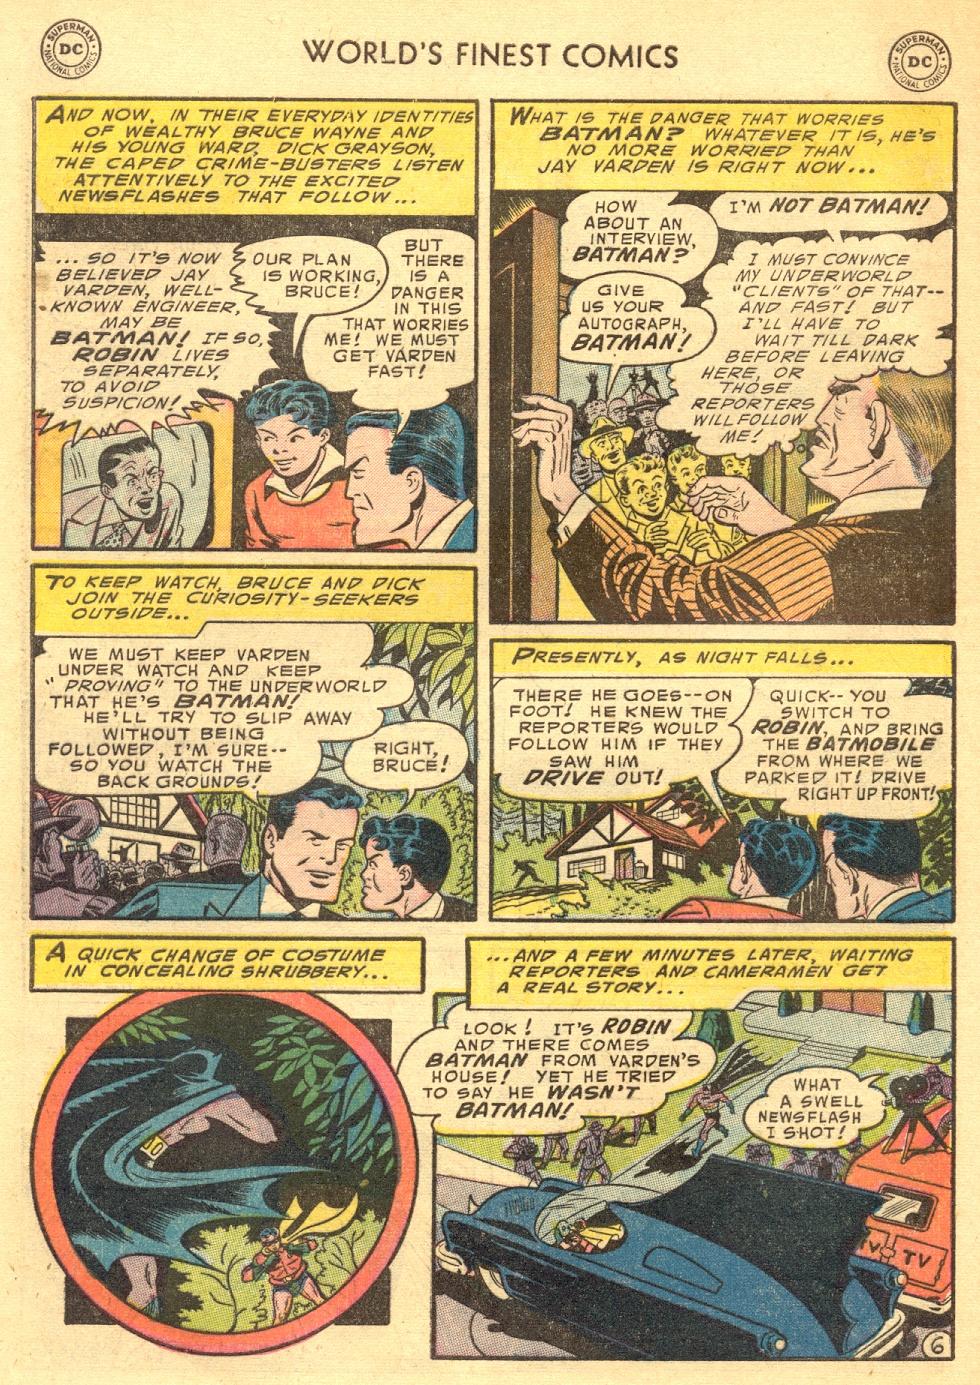 Read online World's Finest Comics comic -  Issue #70 - 60